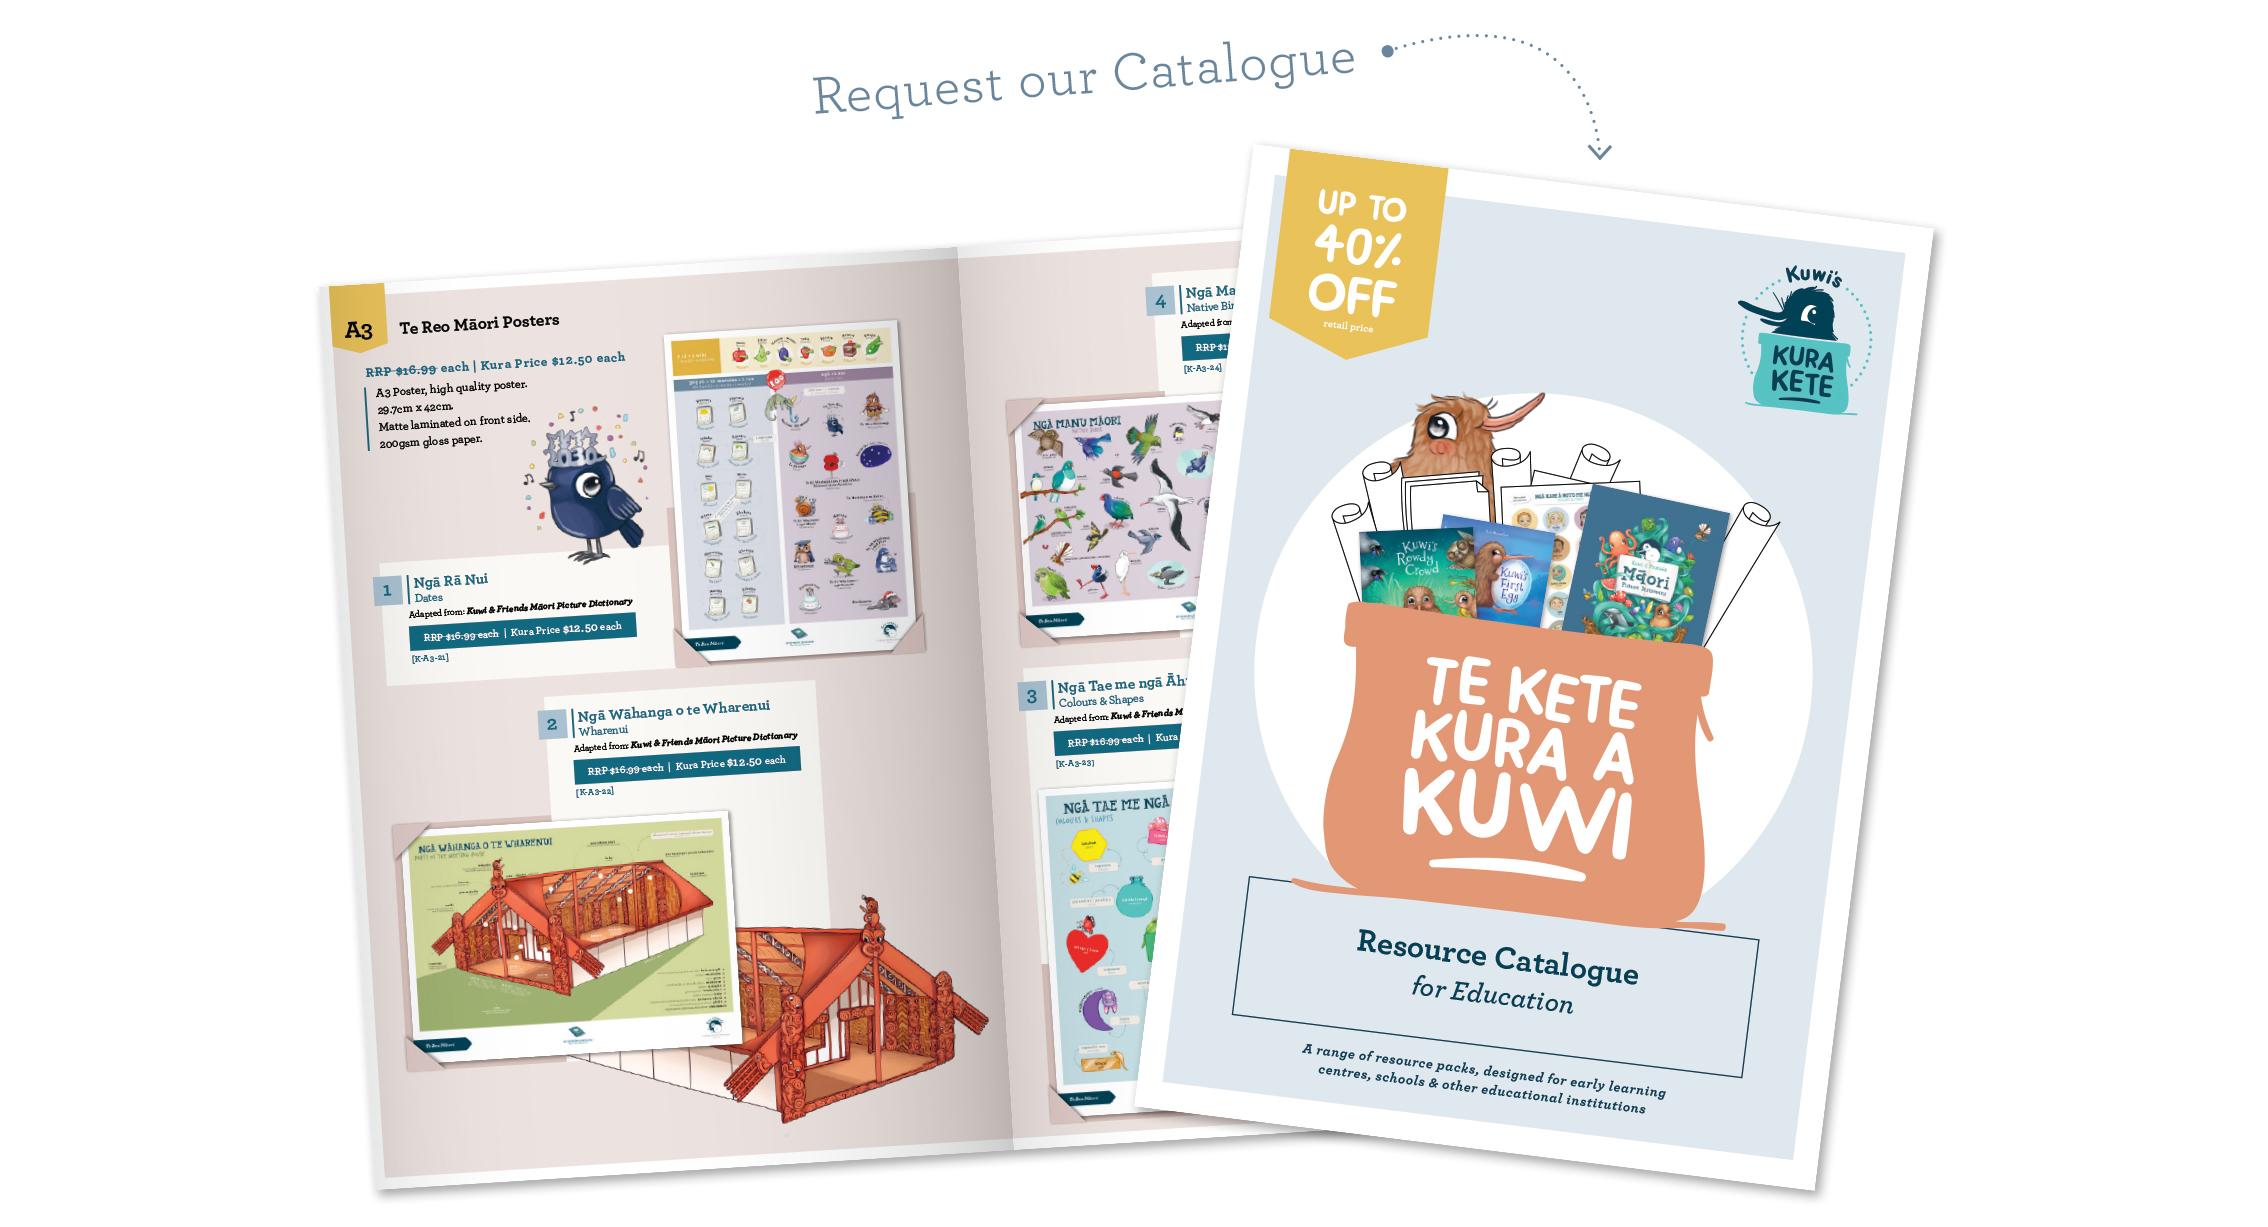 Kuwi Kura Educational Prices Catalogue